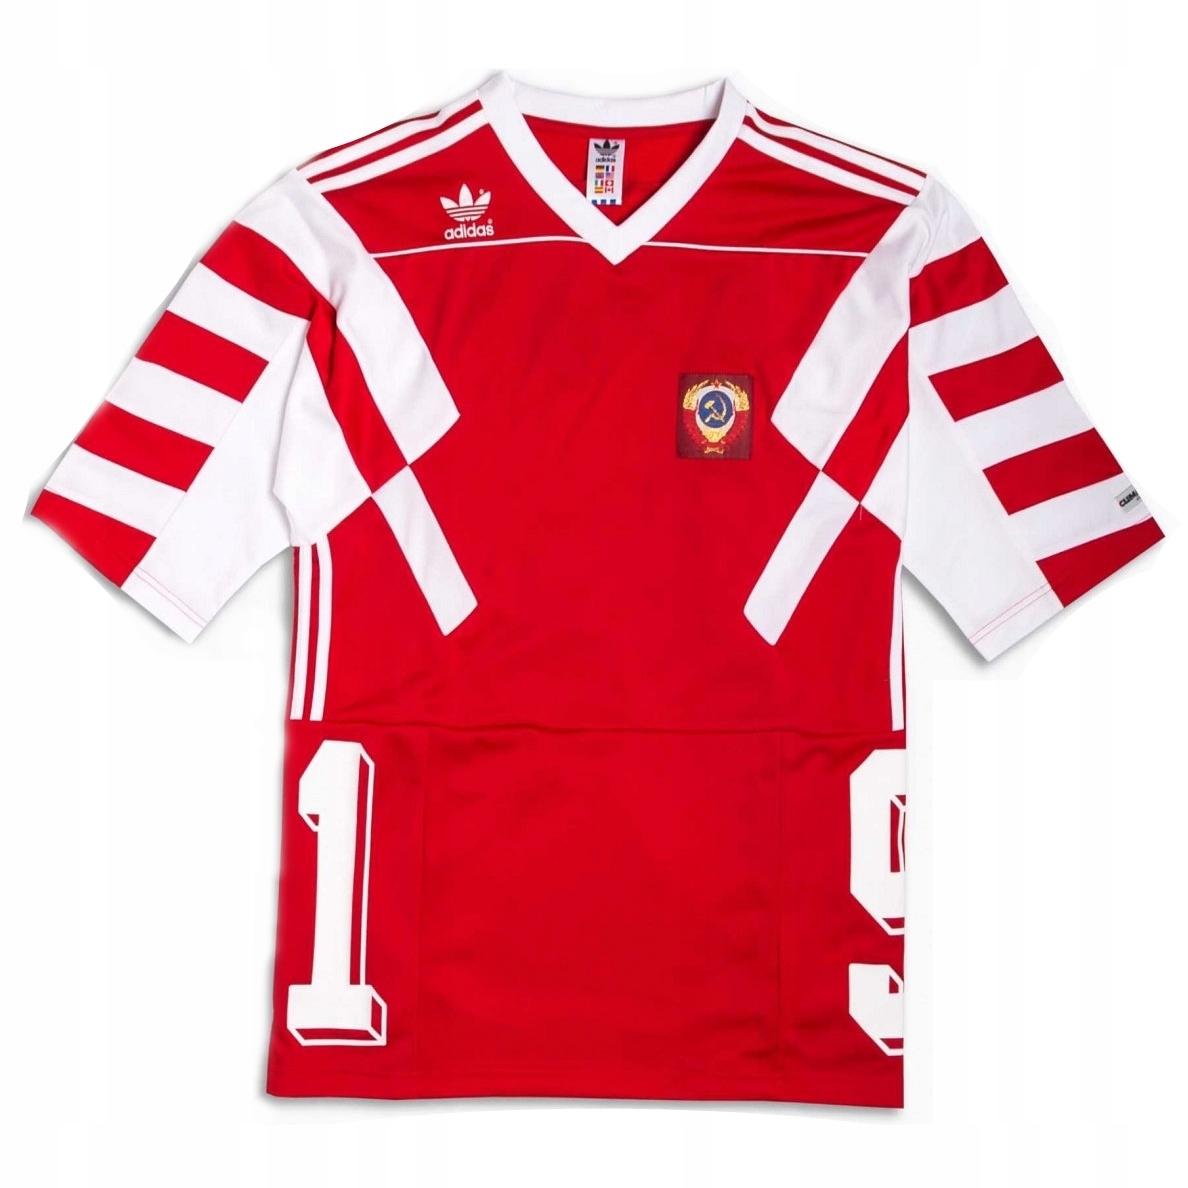 Koszulka Adidas Originals Rosja CCCP CV7 T shirt L